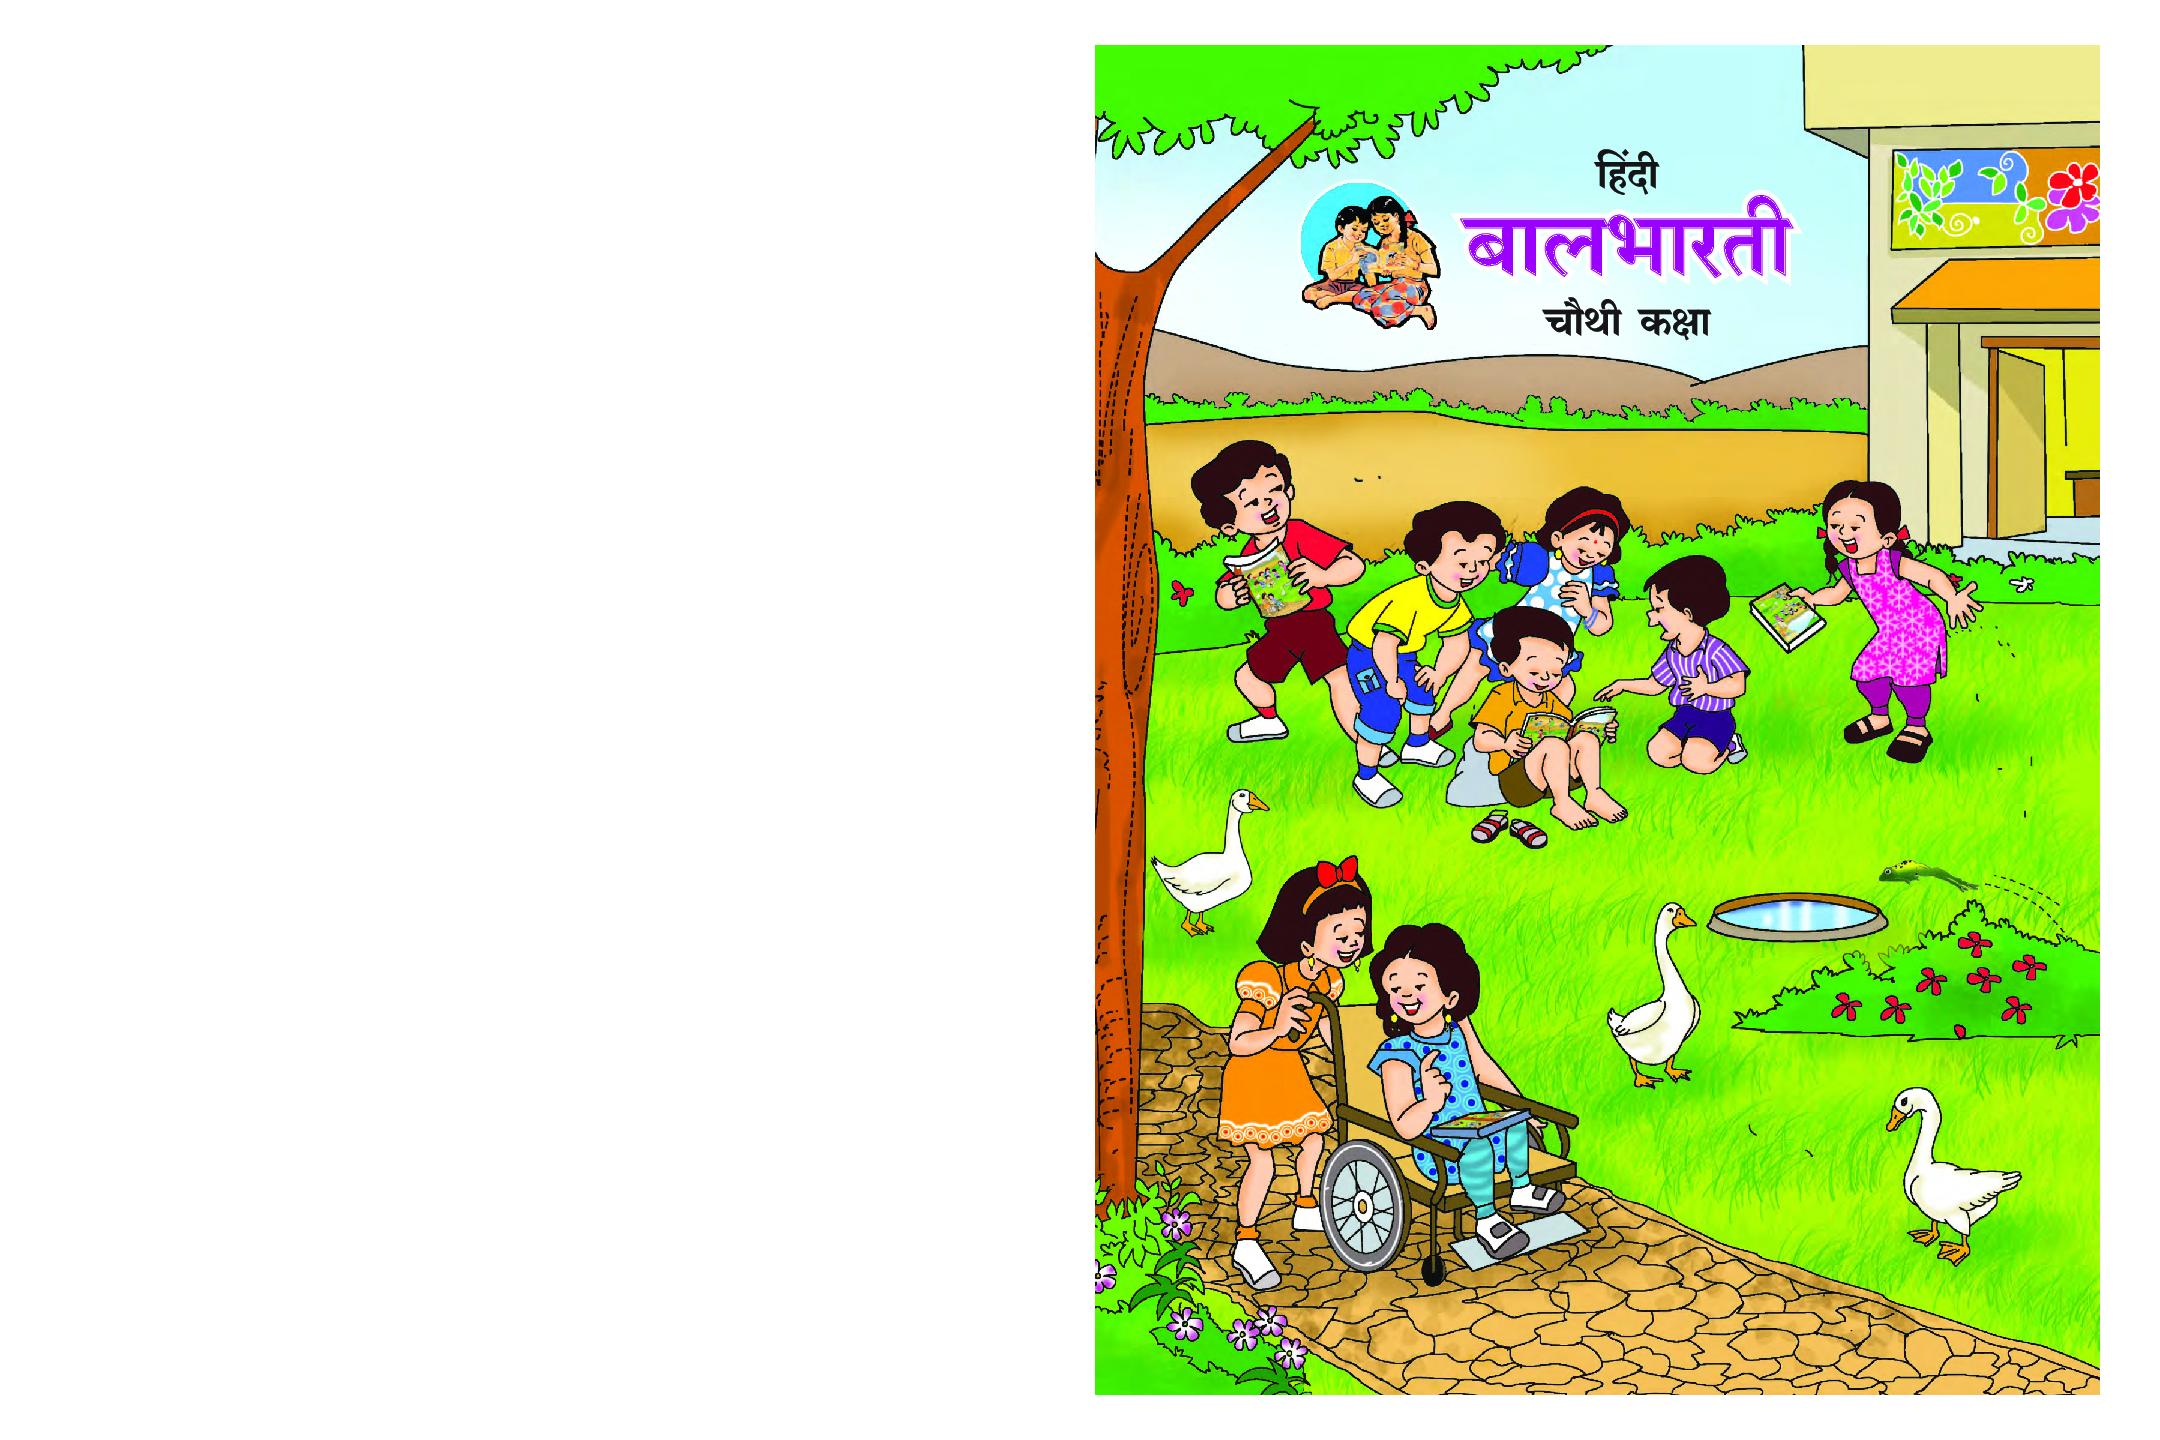 Maharashtra School Textbook बालभारती For Class-4 - Page 1